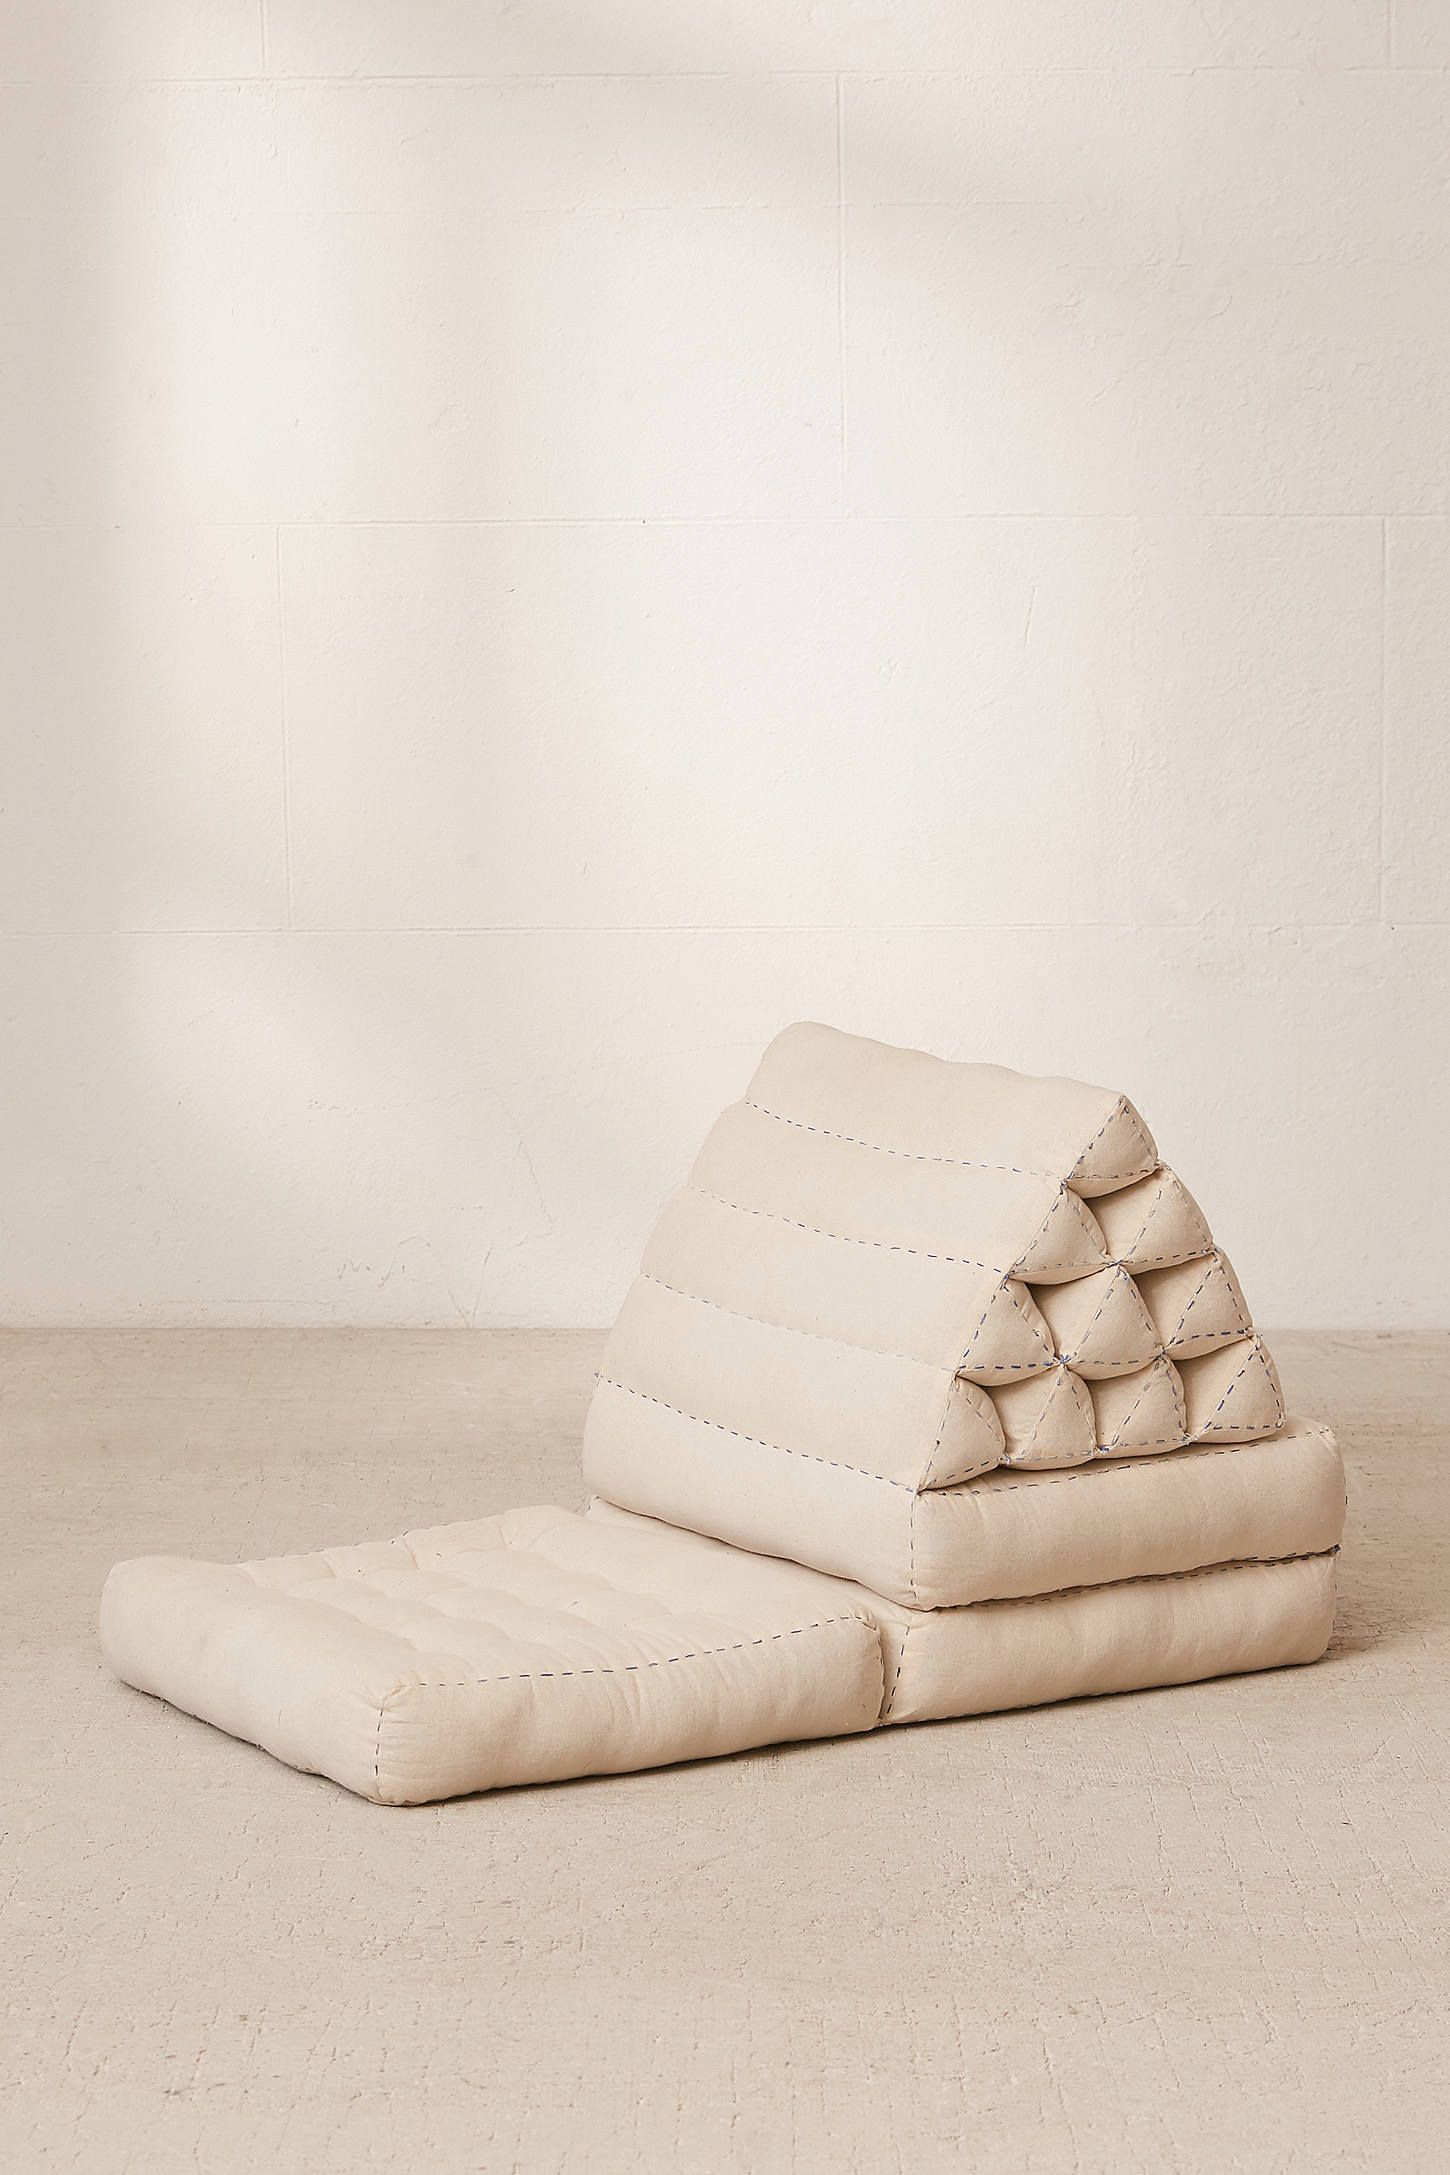 Convertible Triangle Floor Cushion in 2020 Floor